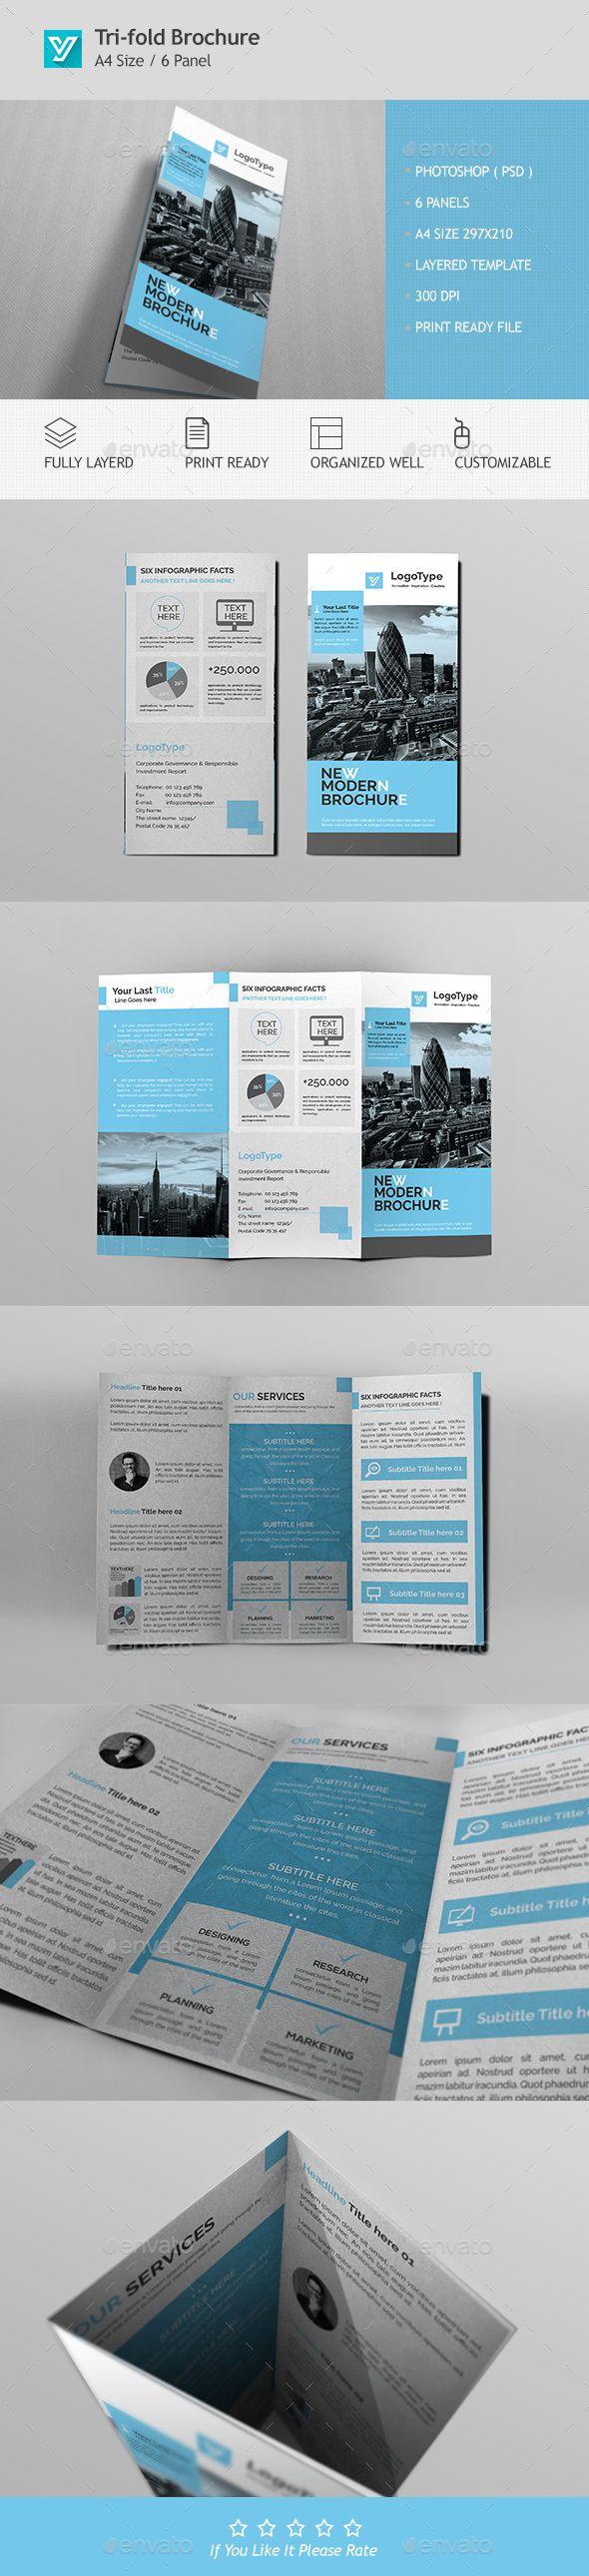 Best Law Firm Brochure Design Images On   Brochure